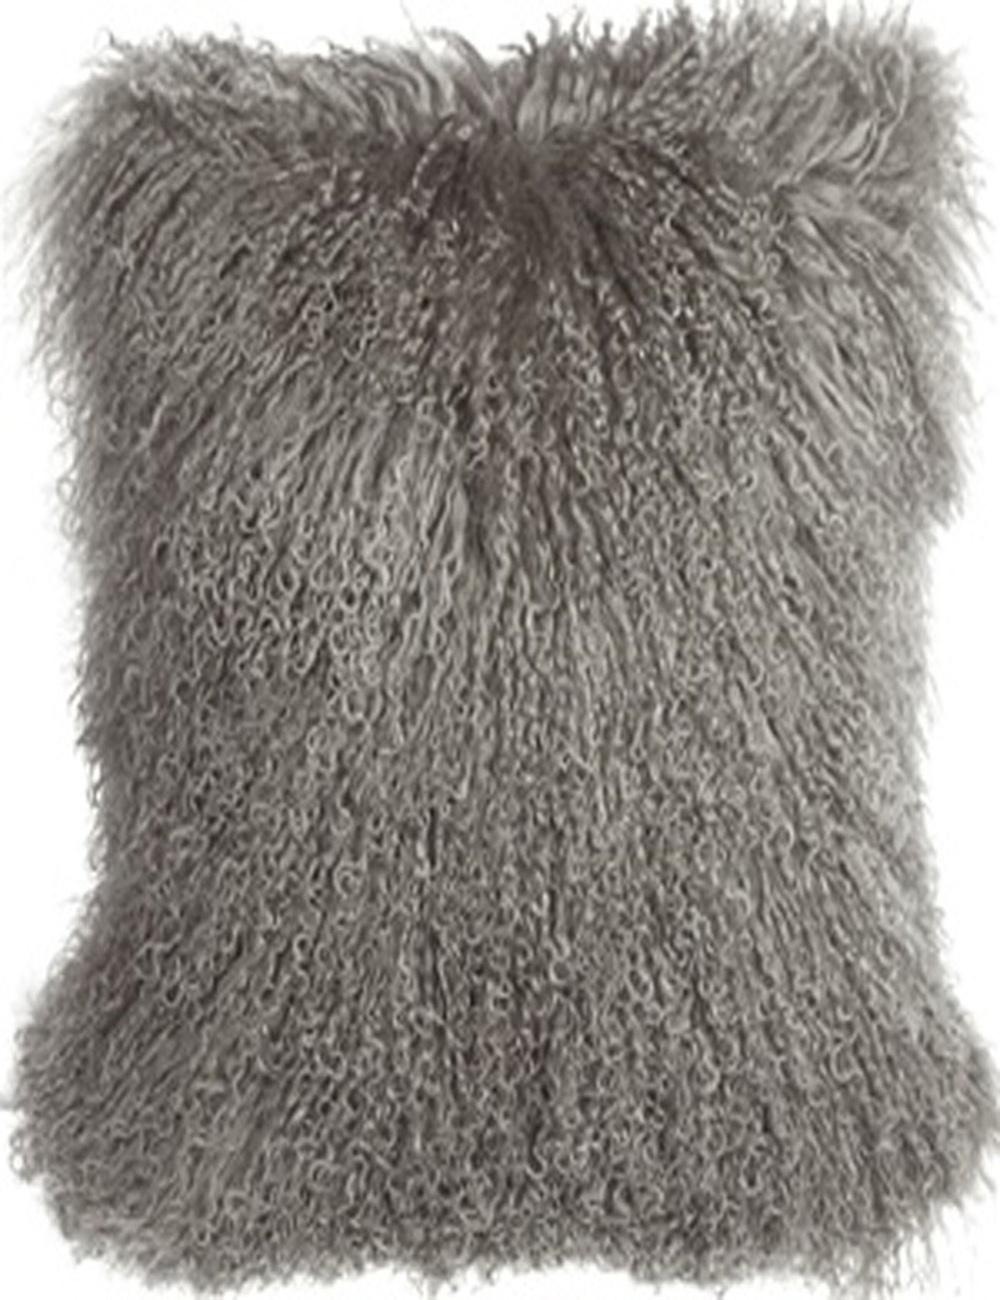 Fur Throw Pillow Covers : 2016 Free Shipping Gray Mongolian Lamb Fur Pillow Cover Tibetan Fur cushion covers Decorative ...